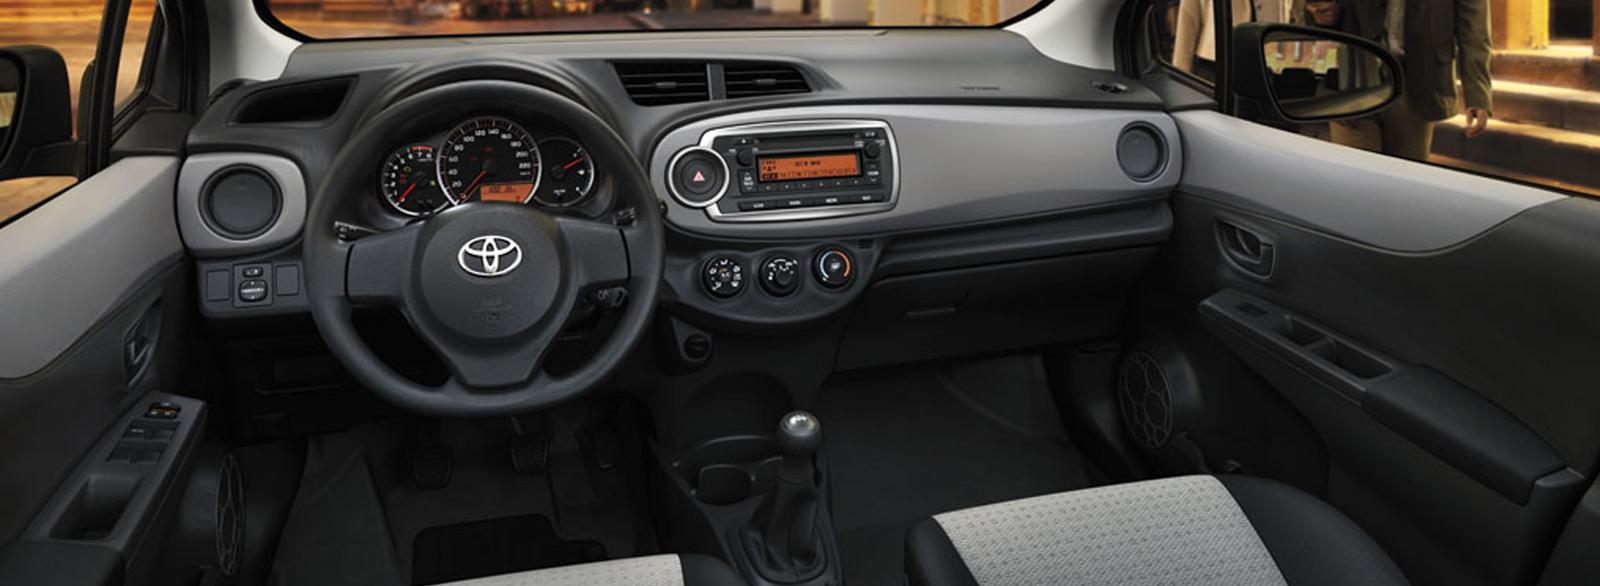 interior-img1